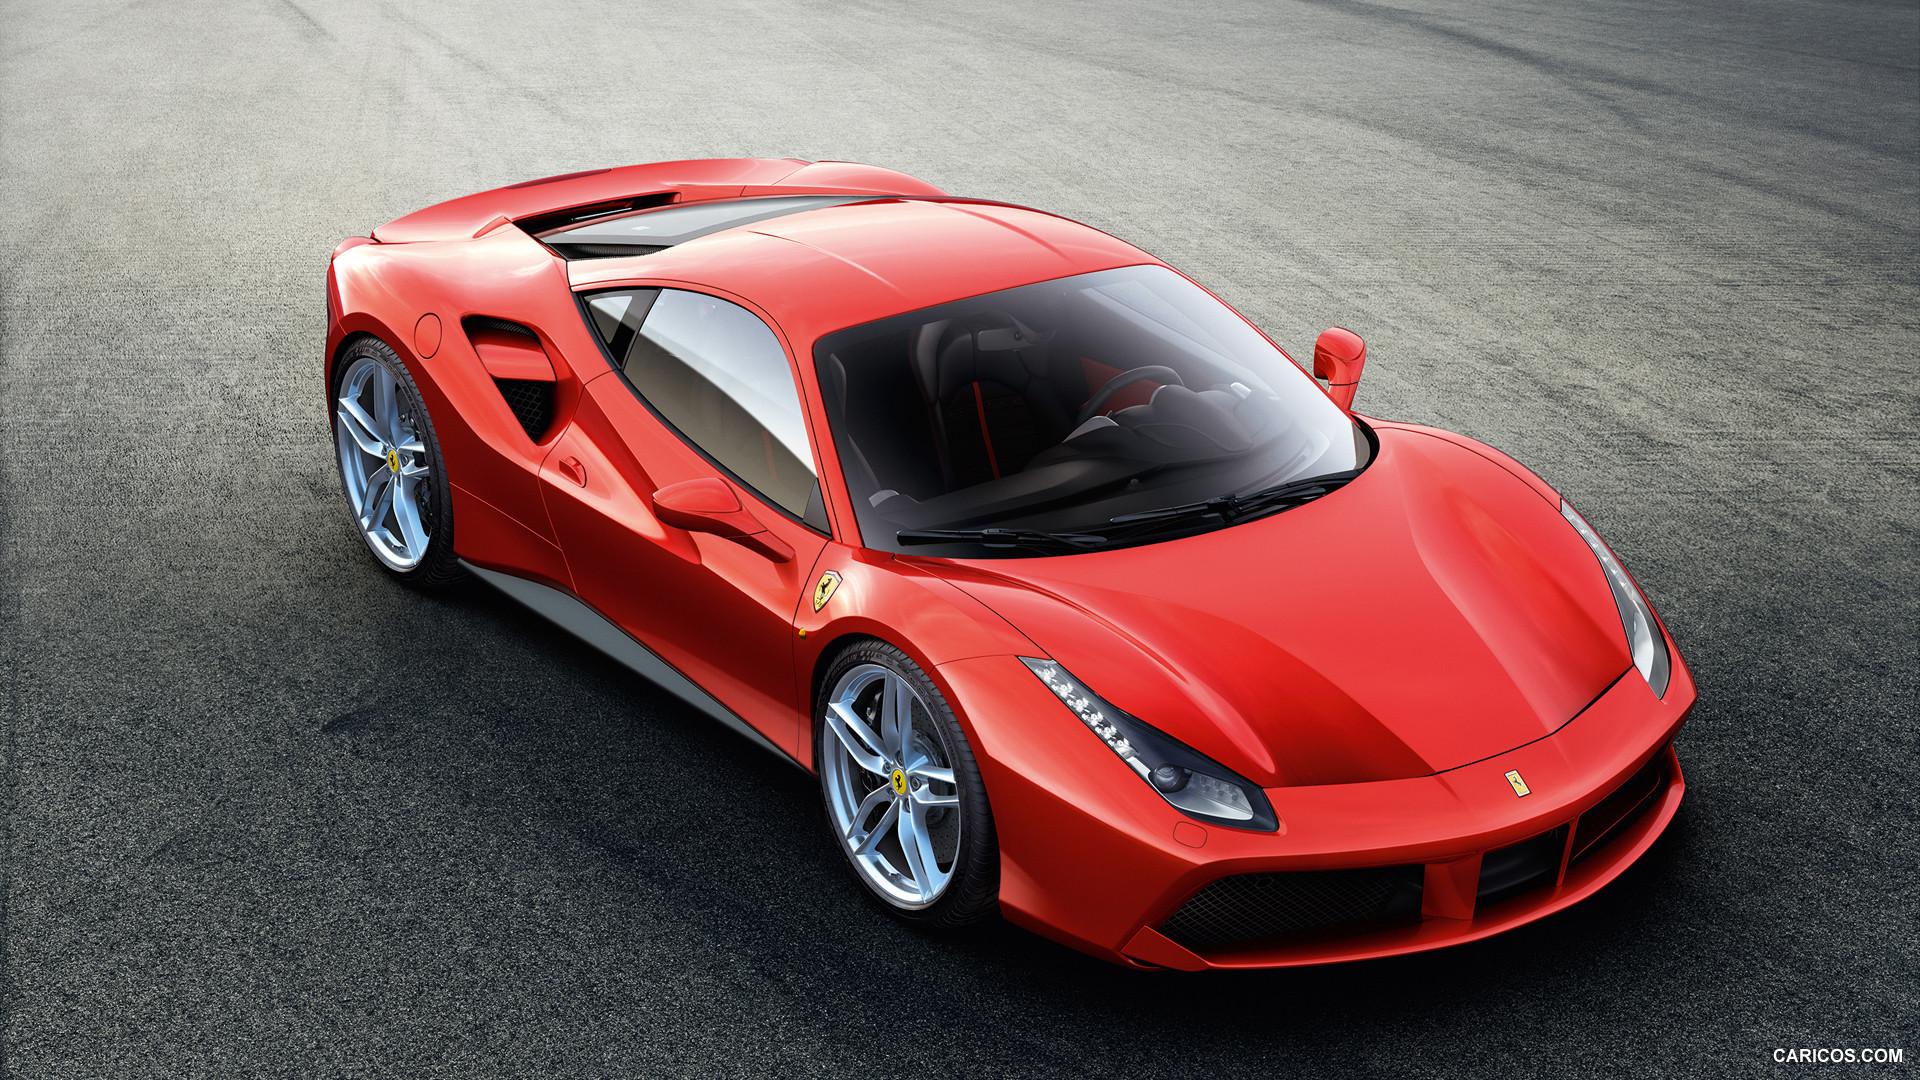 Ferrari 488 Wallpapers Vehicles Hq Ferrari 488 Pictures 4k Wallpapers 2019